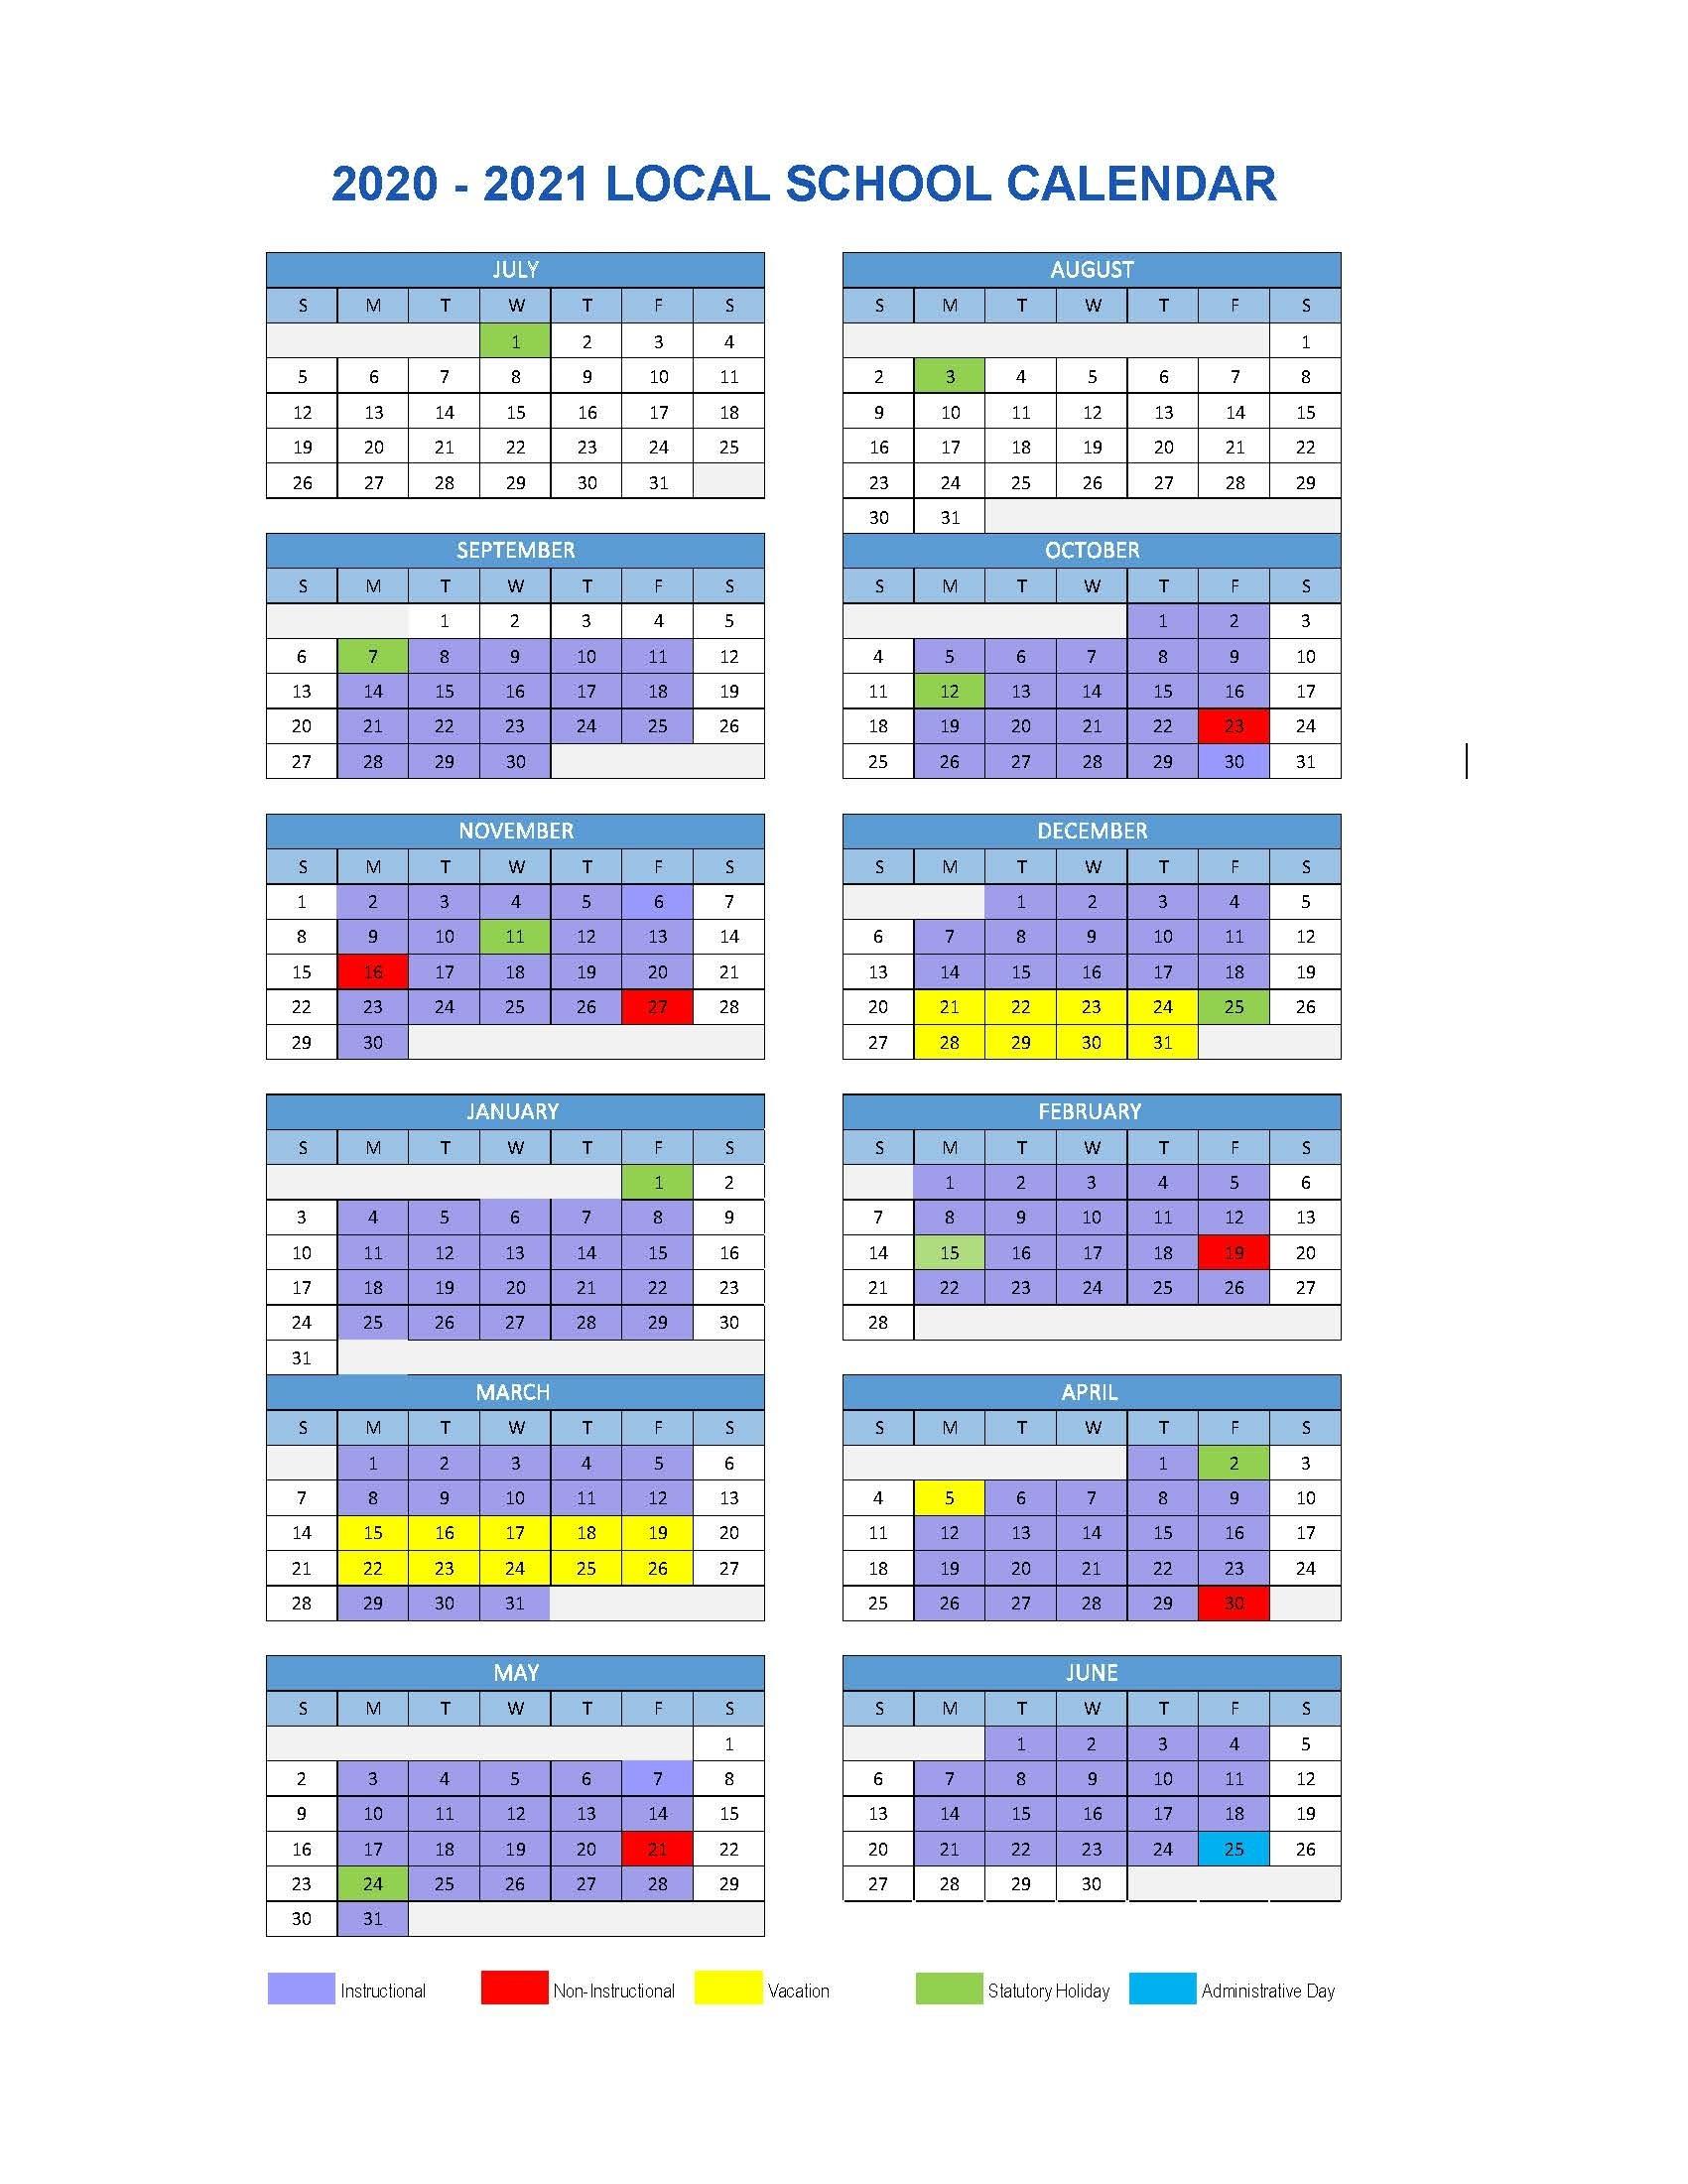 Local School Calendar 2020/2021 | Chilliwack School District #33 2021 Myanmar Calendar Microsoft Office